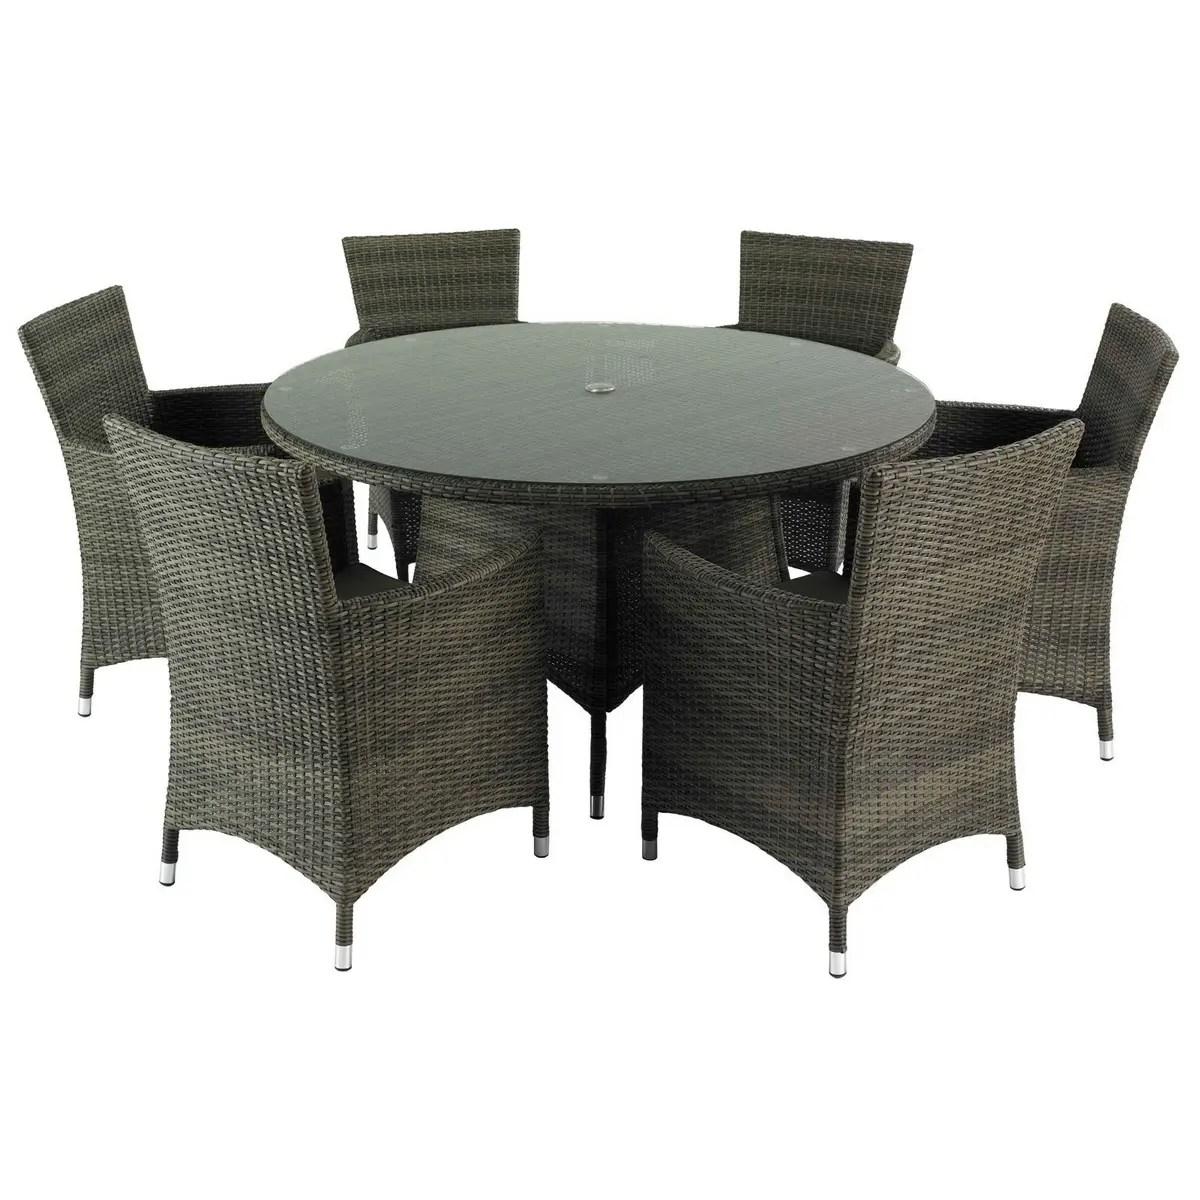 Hartman Bentley 6 Seat Dining Set HBENSET03 Garden Furniture World